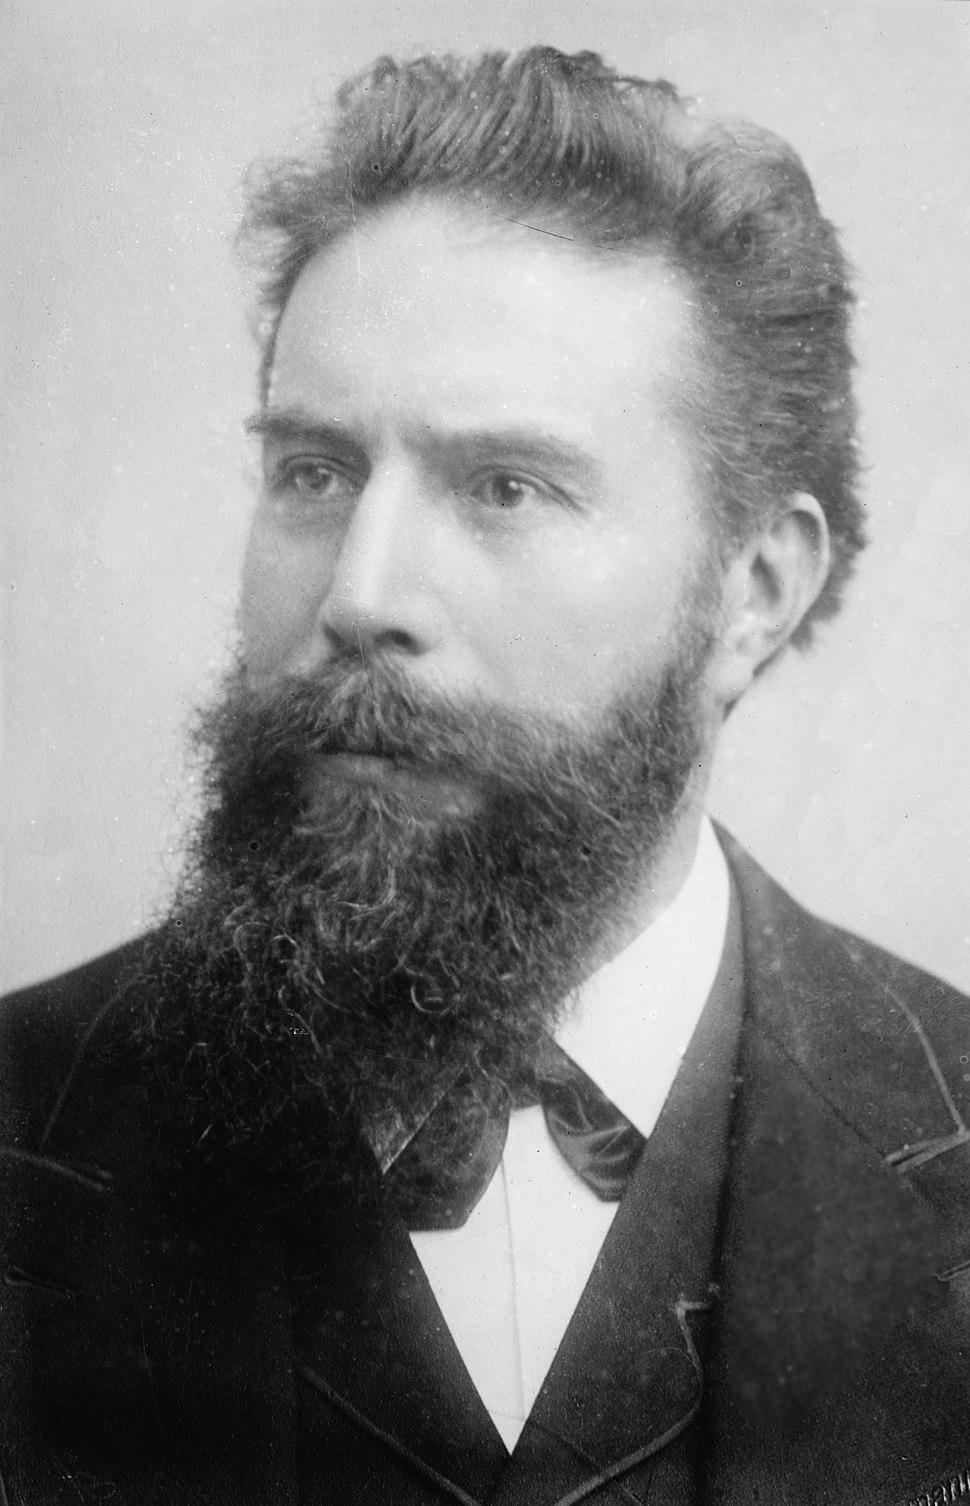 R%C3%B6ntgen, Wilhelm Conrad (1845-1923)